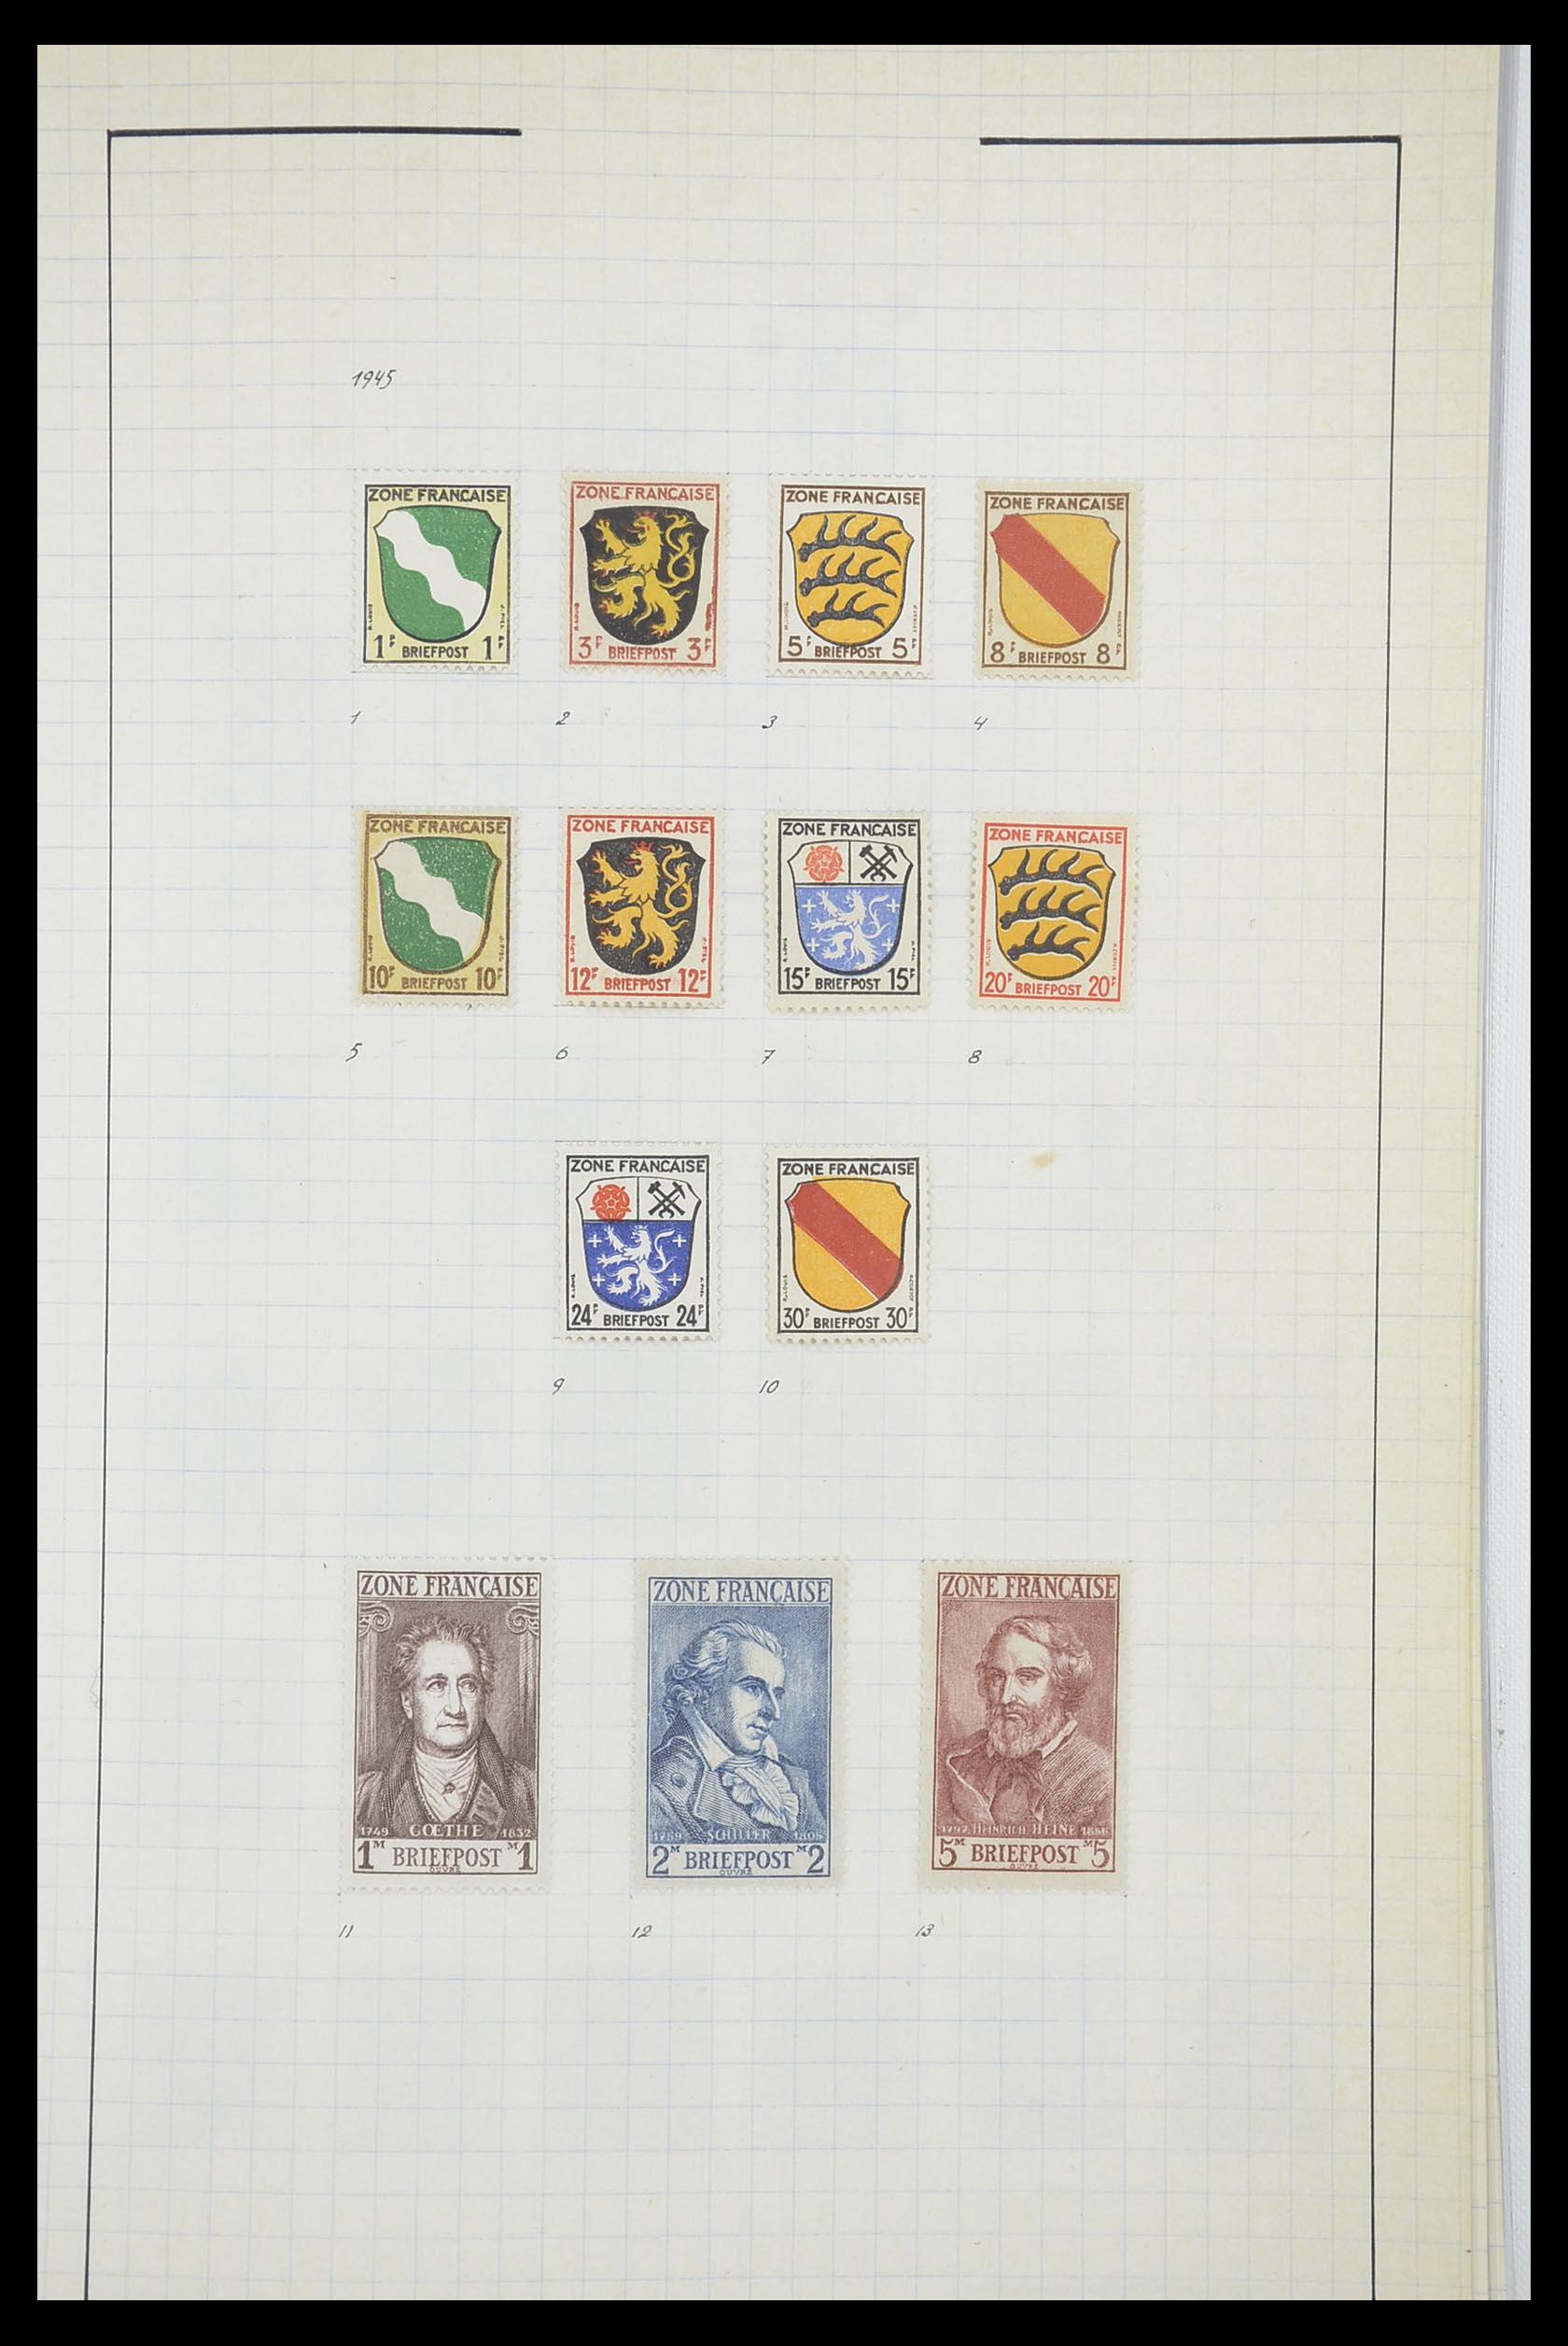 33864 002 - Postzegelverzameling 33864 Franse Zone 1945-1949.